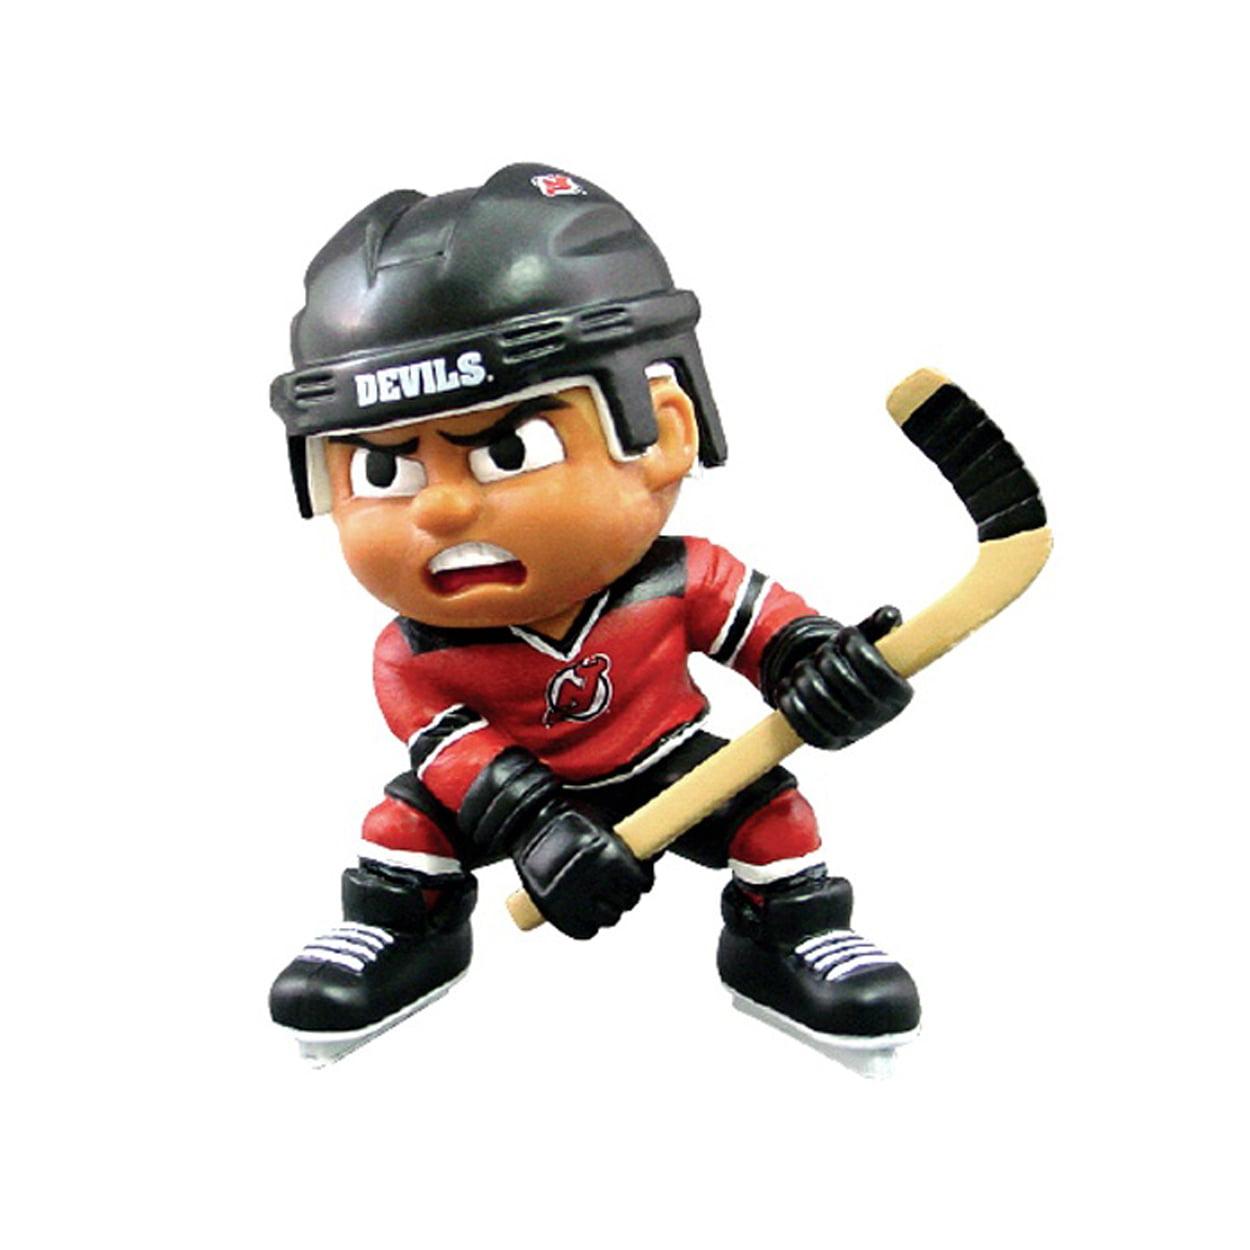 Lil' Teammates Slapper - New Jersey Devils